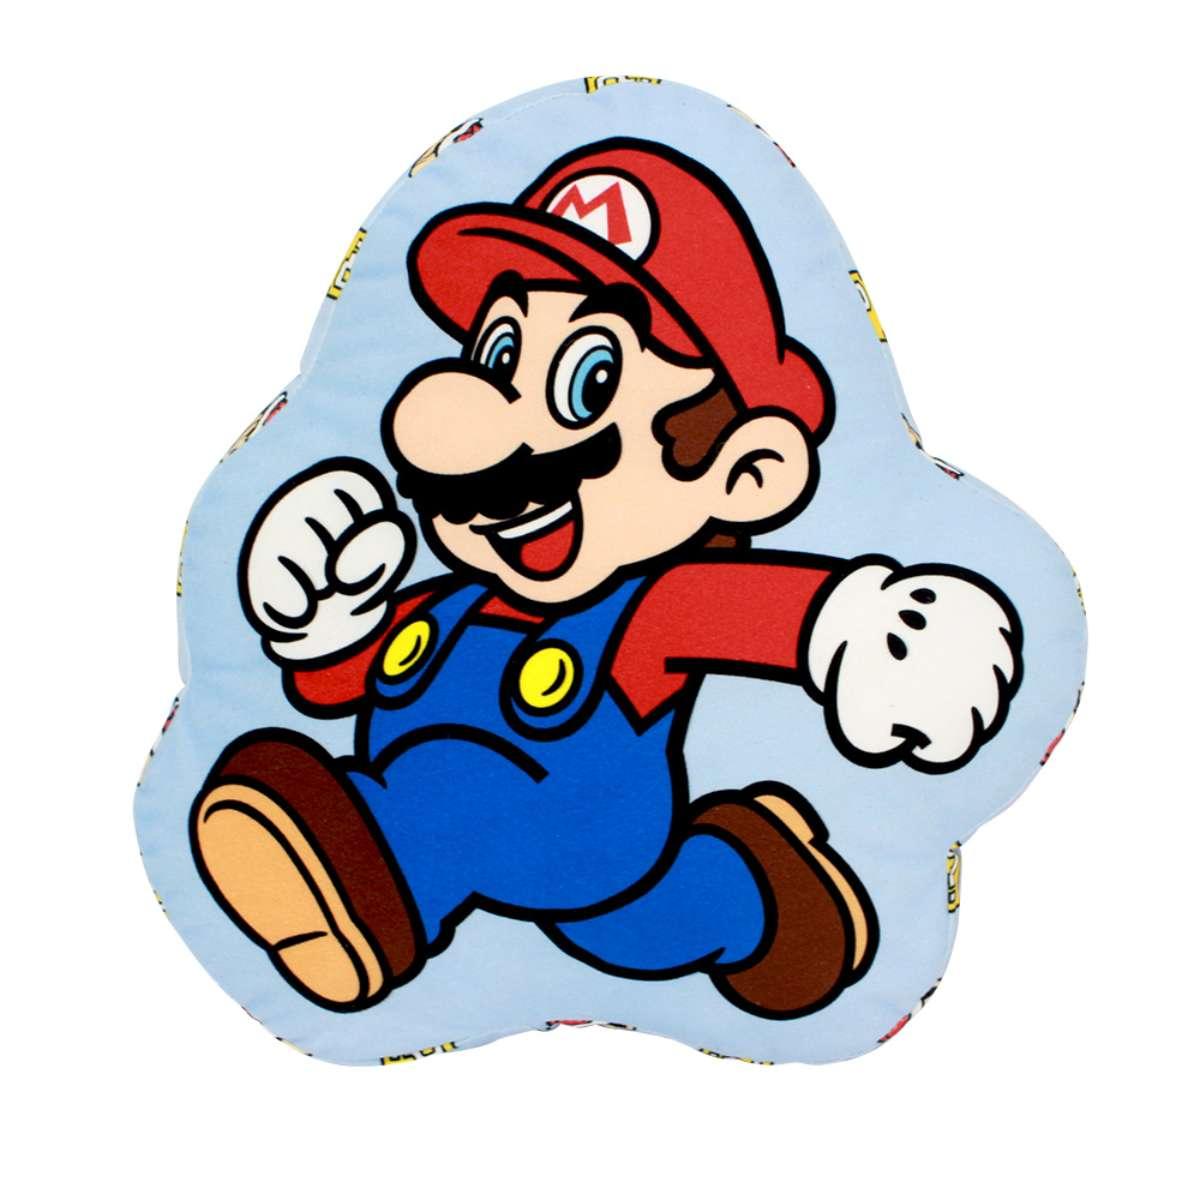 Almofada Decorativa Formato Super Mario Bros Nintendo Correndo